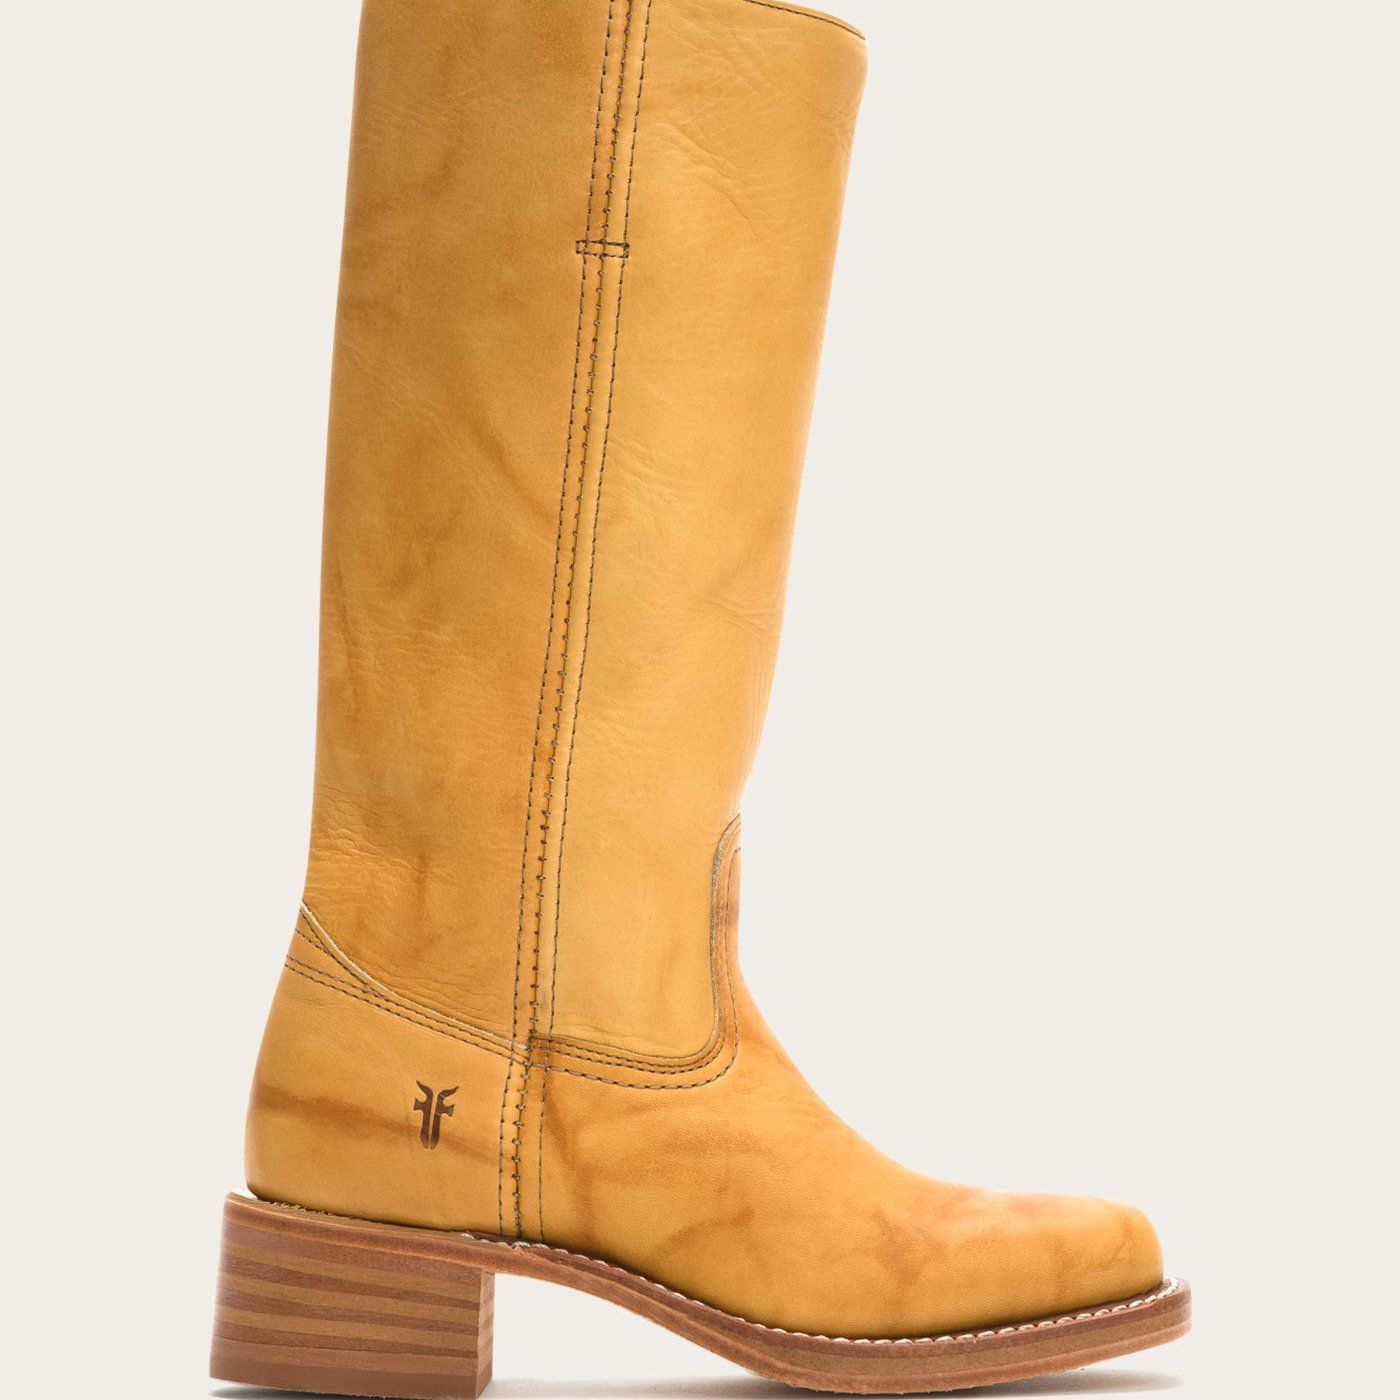 Frye Campus 14L Boots